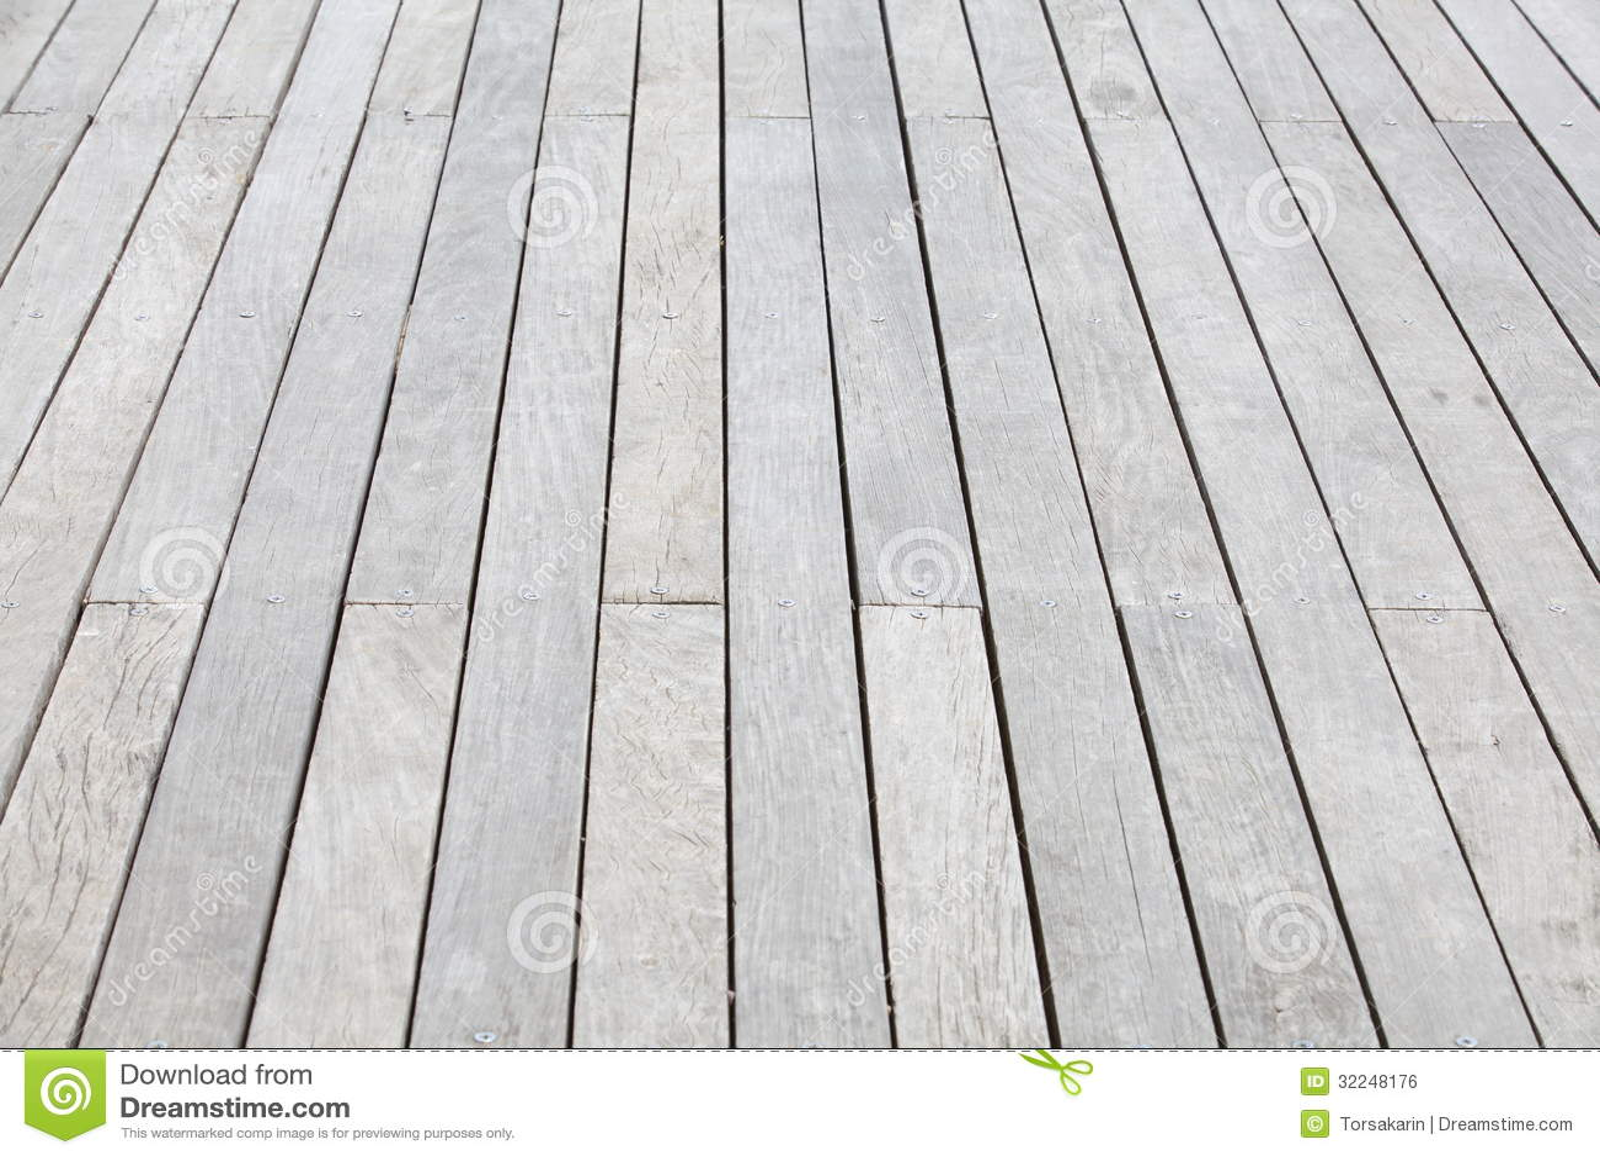 Wood Floor Texture Royalty Free Stock Image